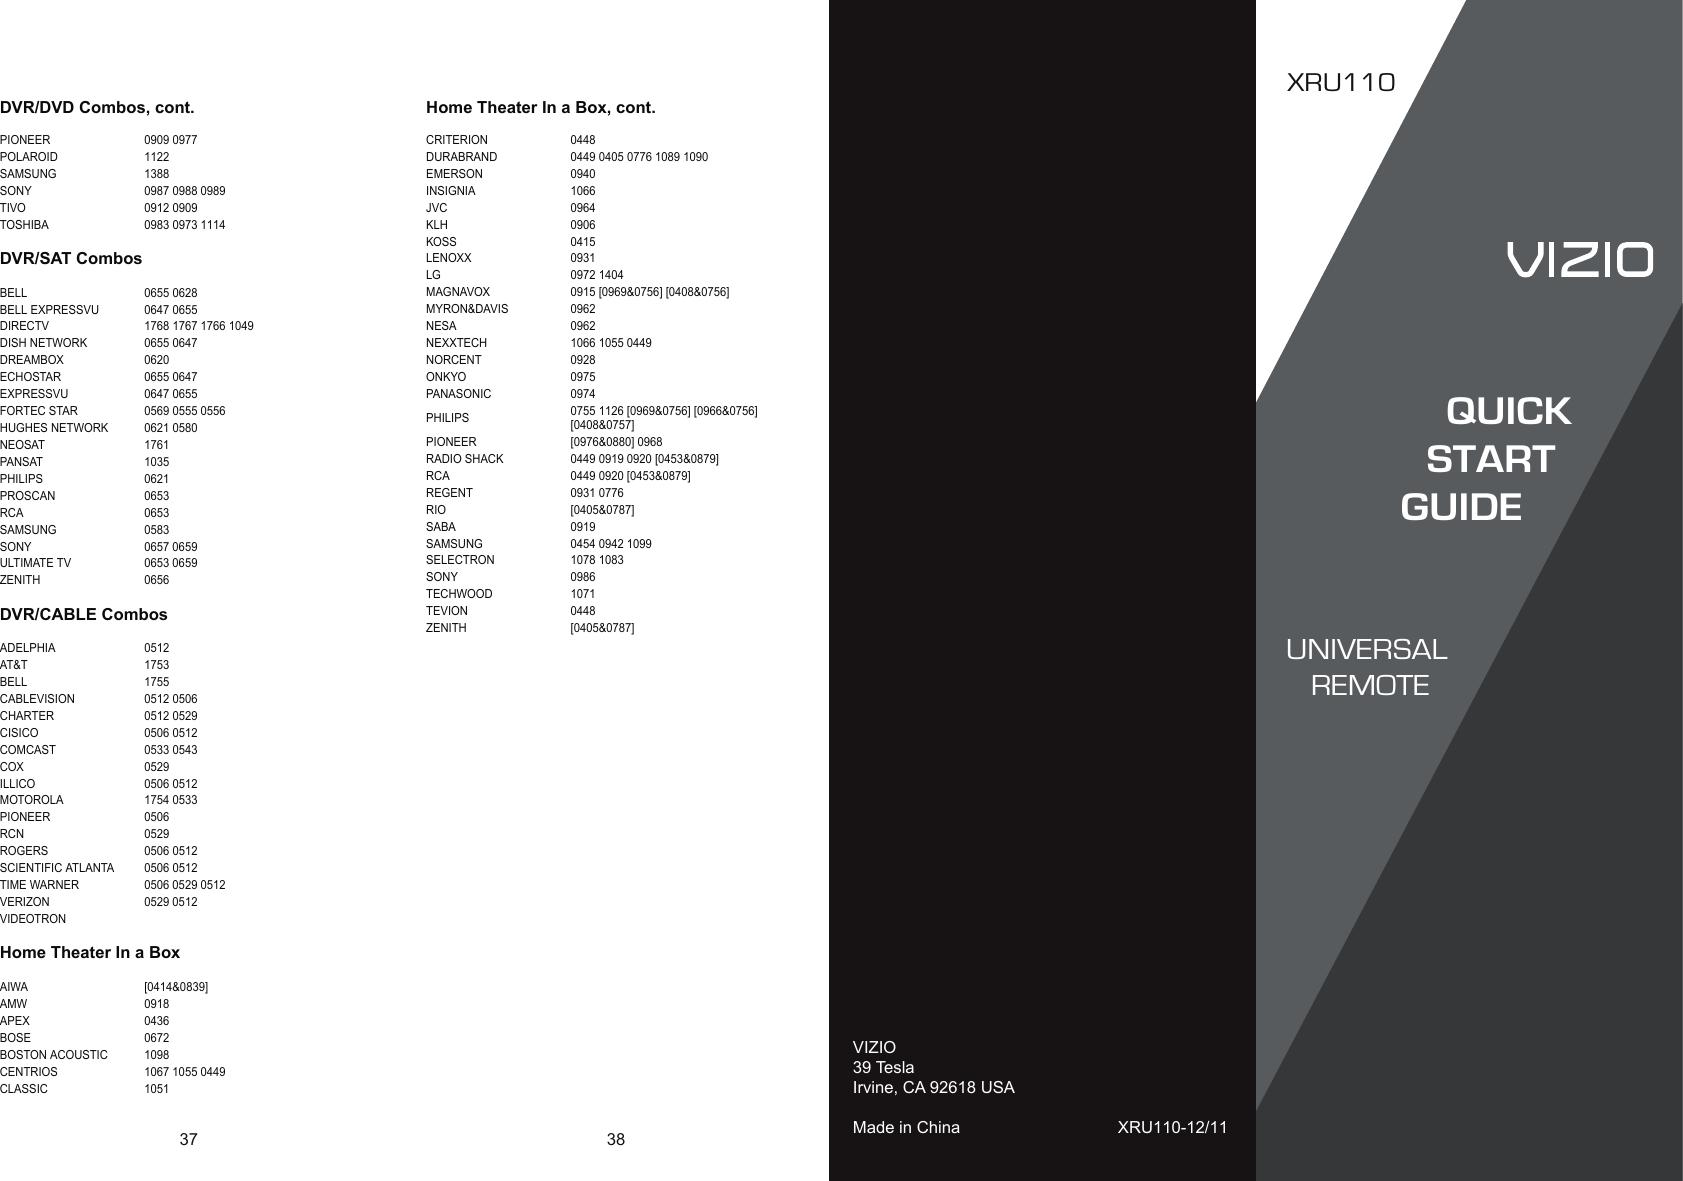 Vizio XRU110 QSG Pg37 Front User Manual To The Abb64624 211f 4927